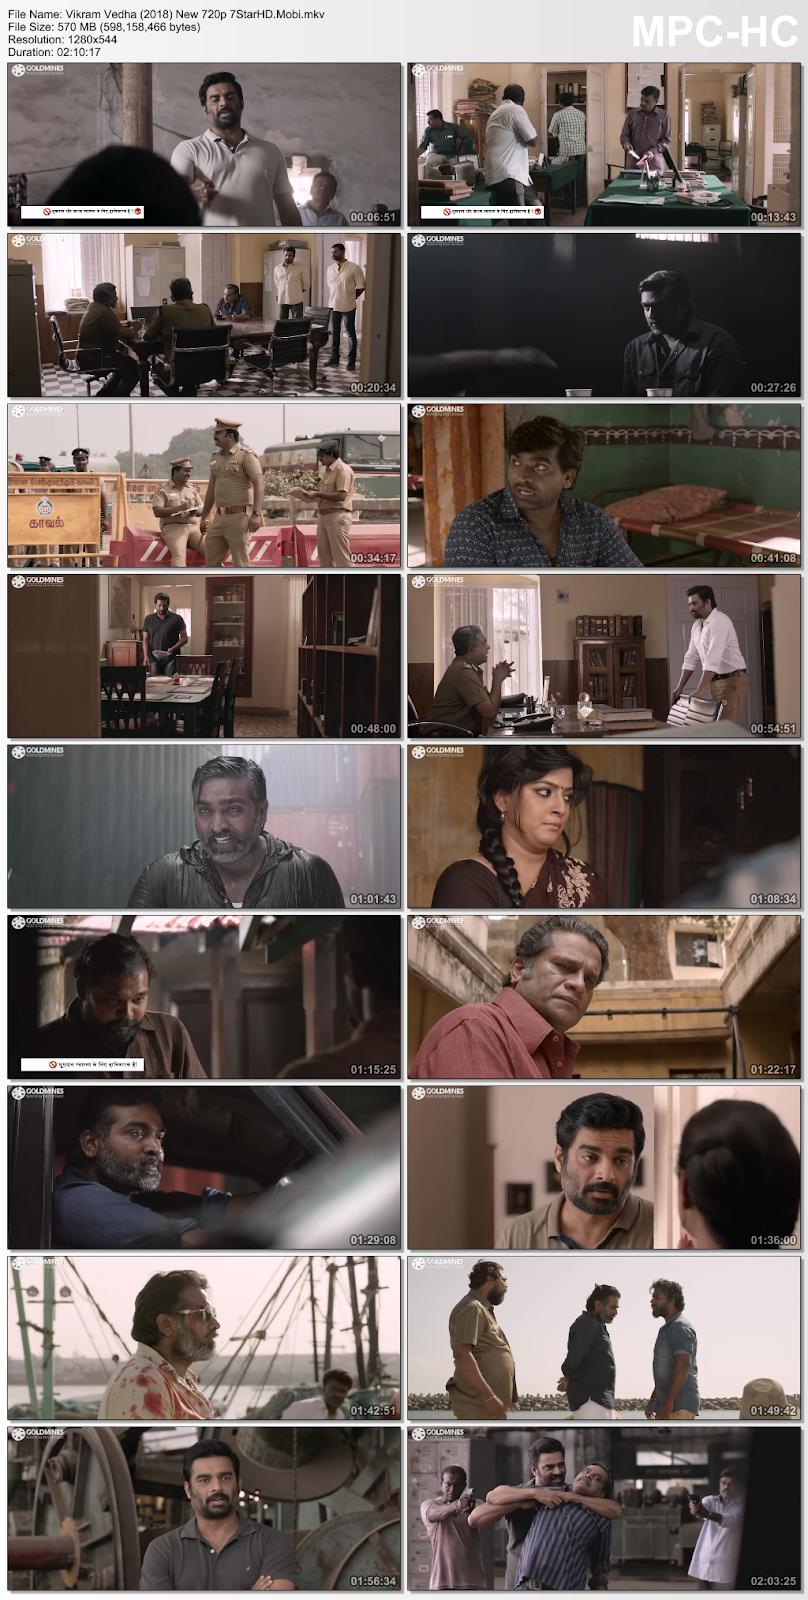 vikram vedha full movie download 400mb